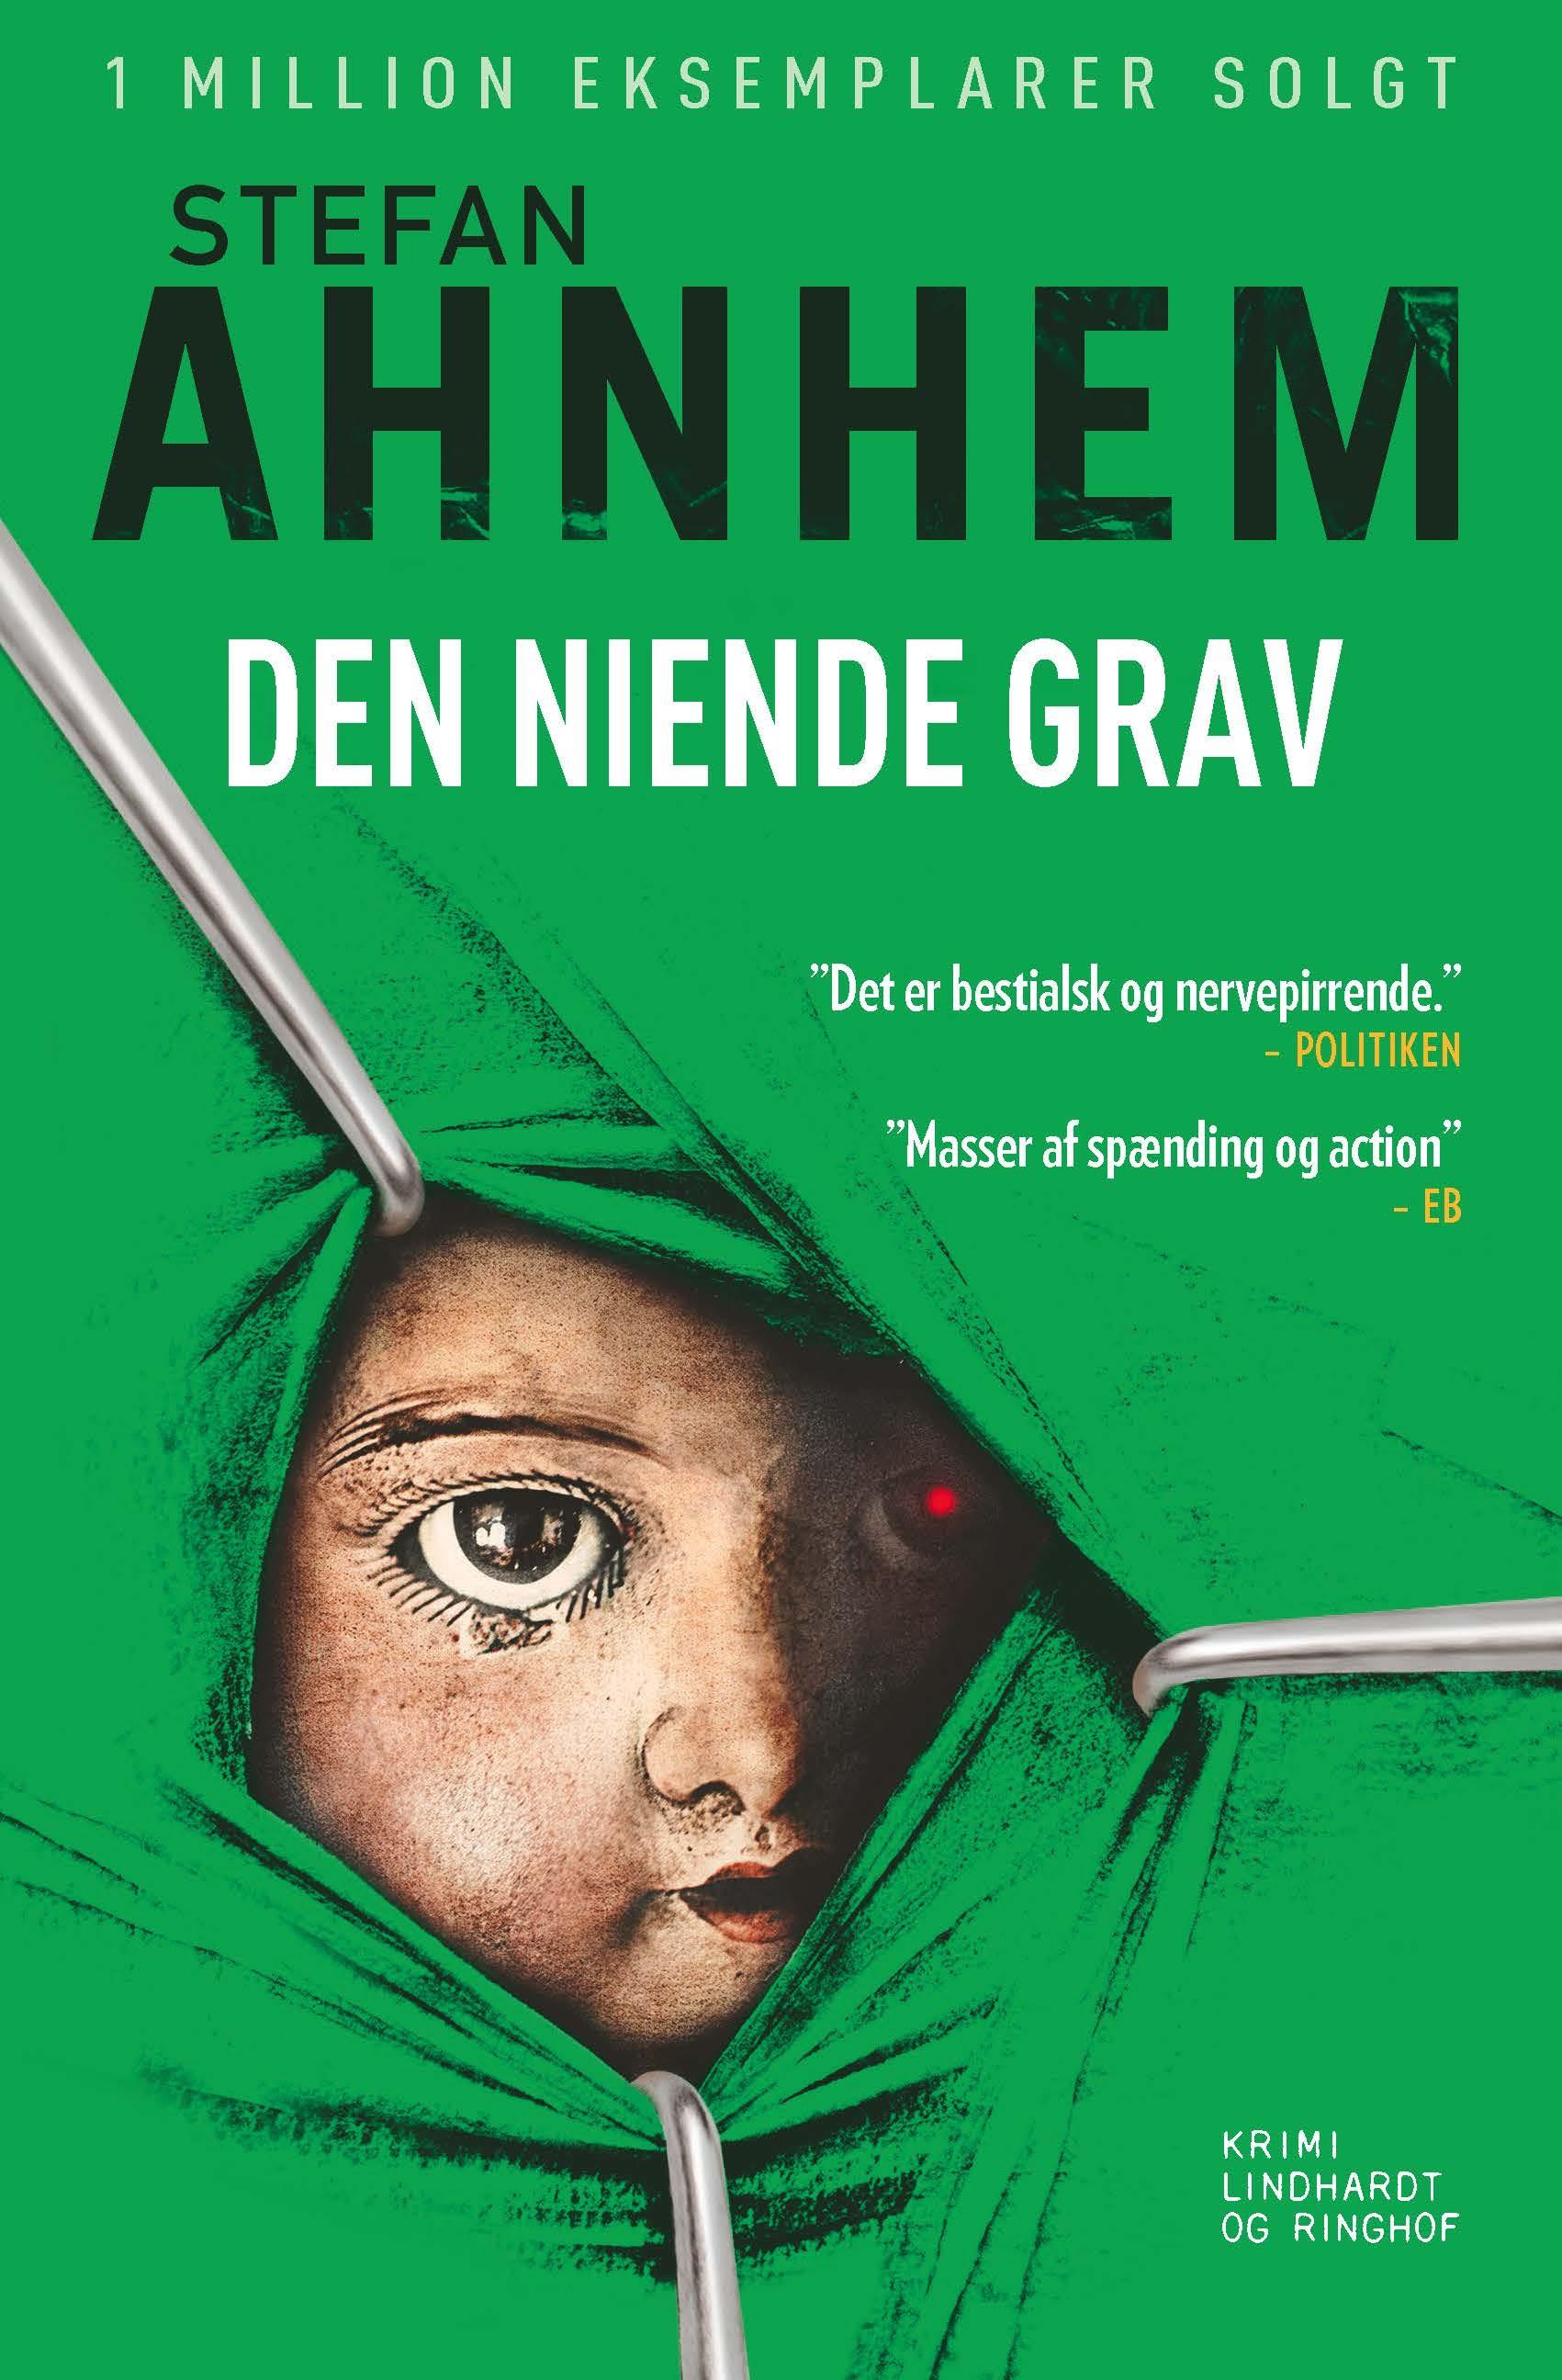 Fabian Risk-serien: Den niende grav - Stefan Ahnhem - Bøger - Lindhardt og Ringhof - 9788711904695 - September 28, 2018